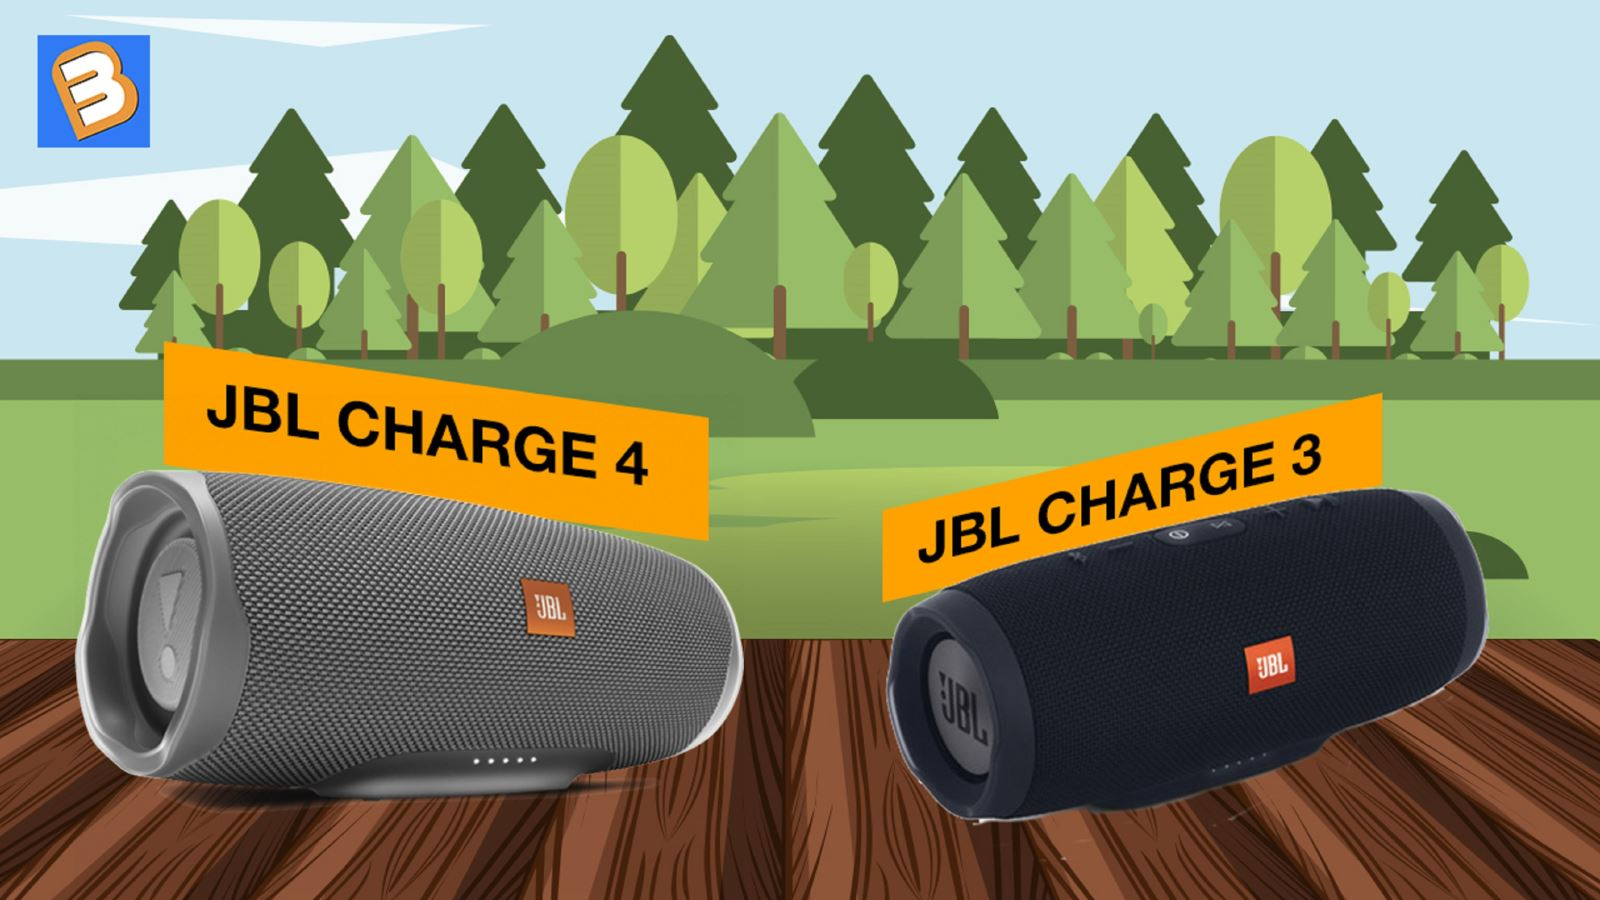 ChọnJBL Charge 4 hay Charge 3